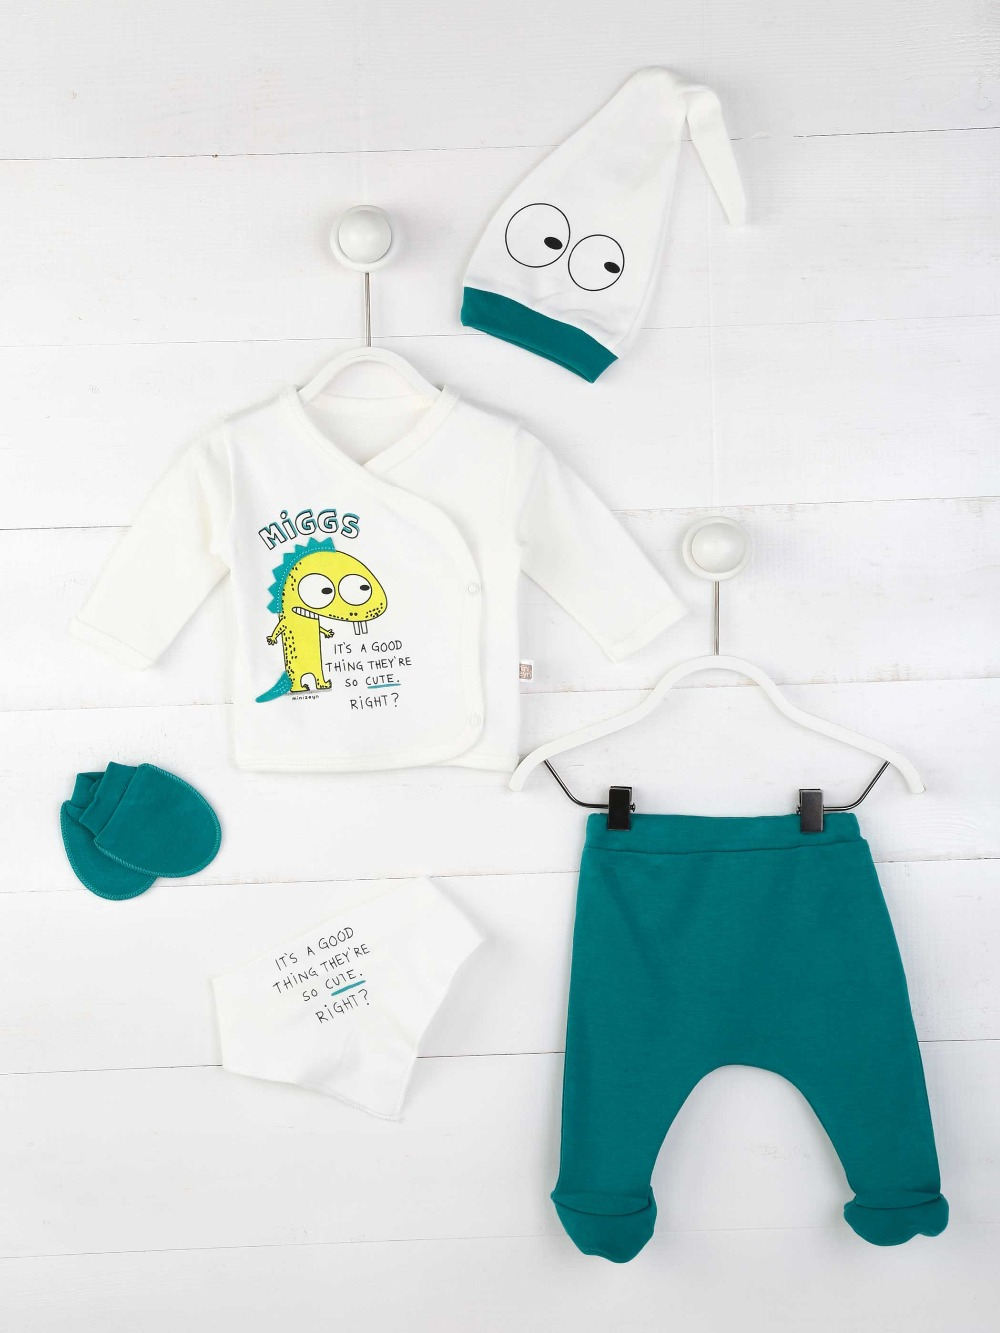 082-5470-049 Petrol Yeşili Erkek Bebek 5 li Hastane Çıkışı (1)